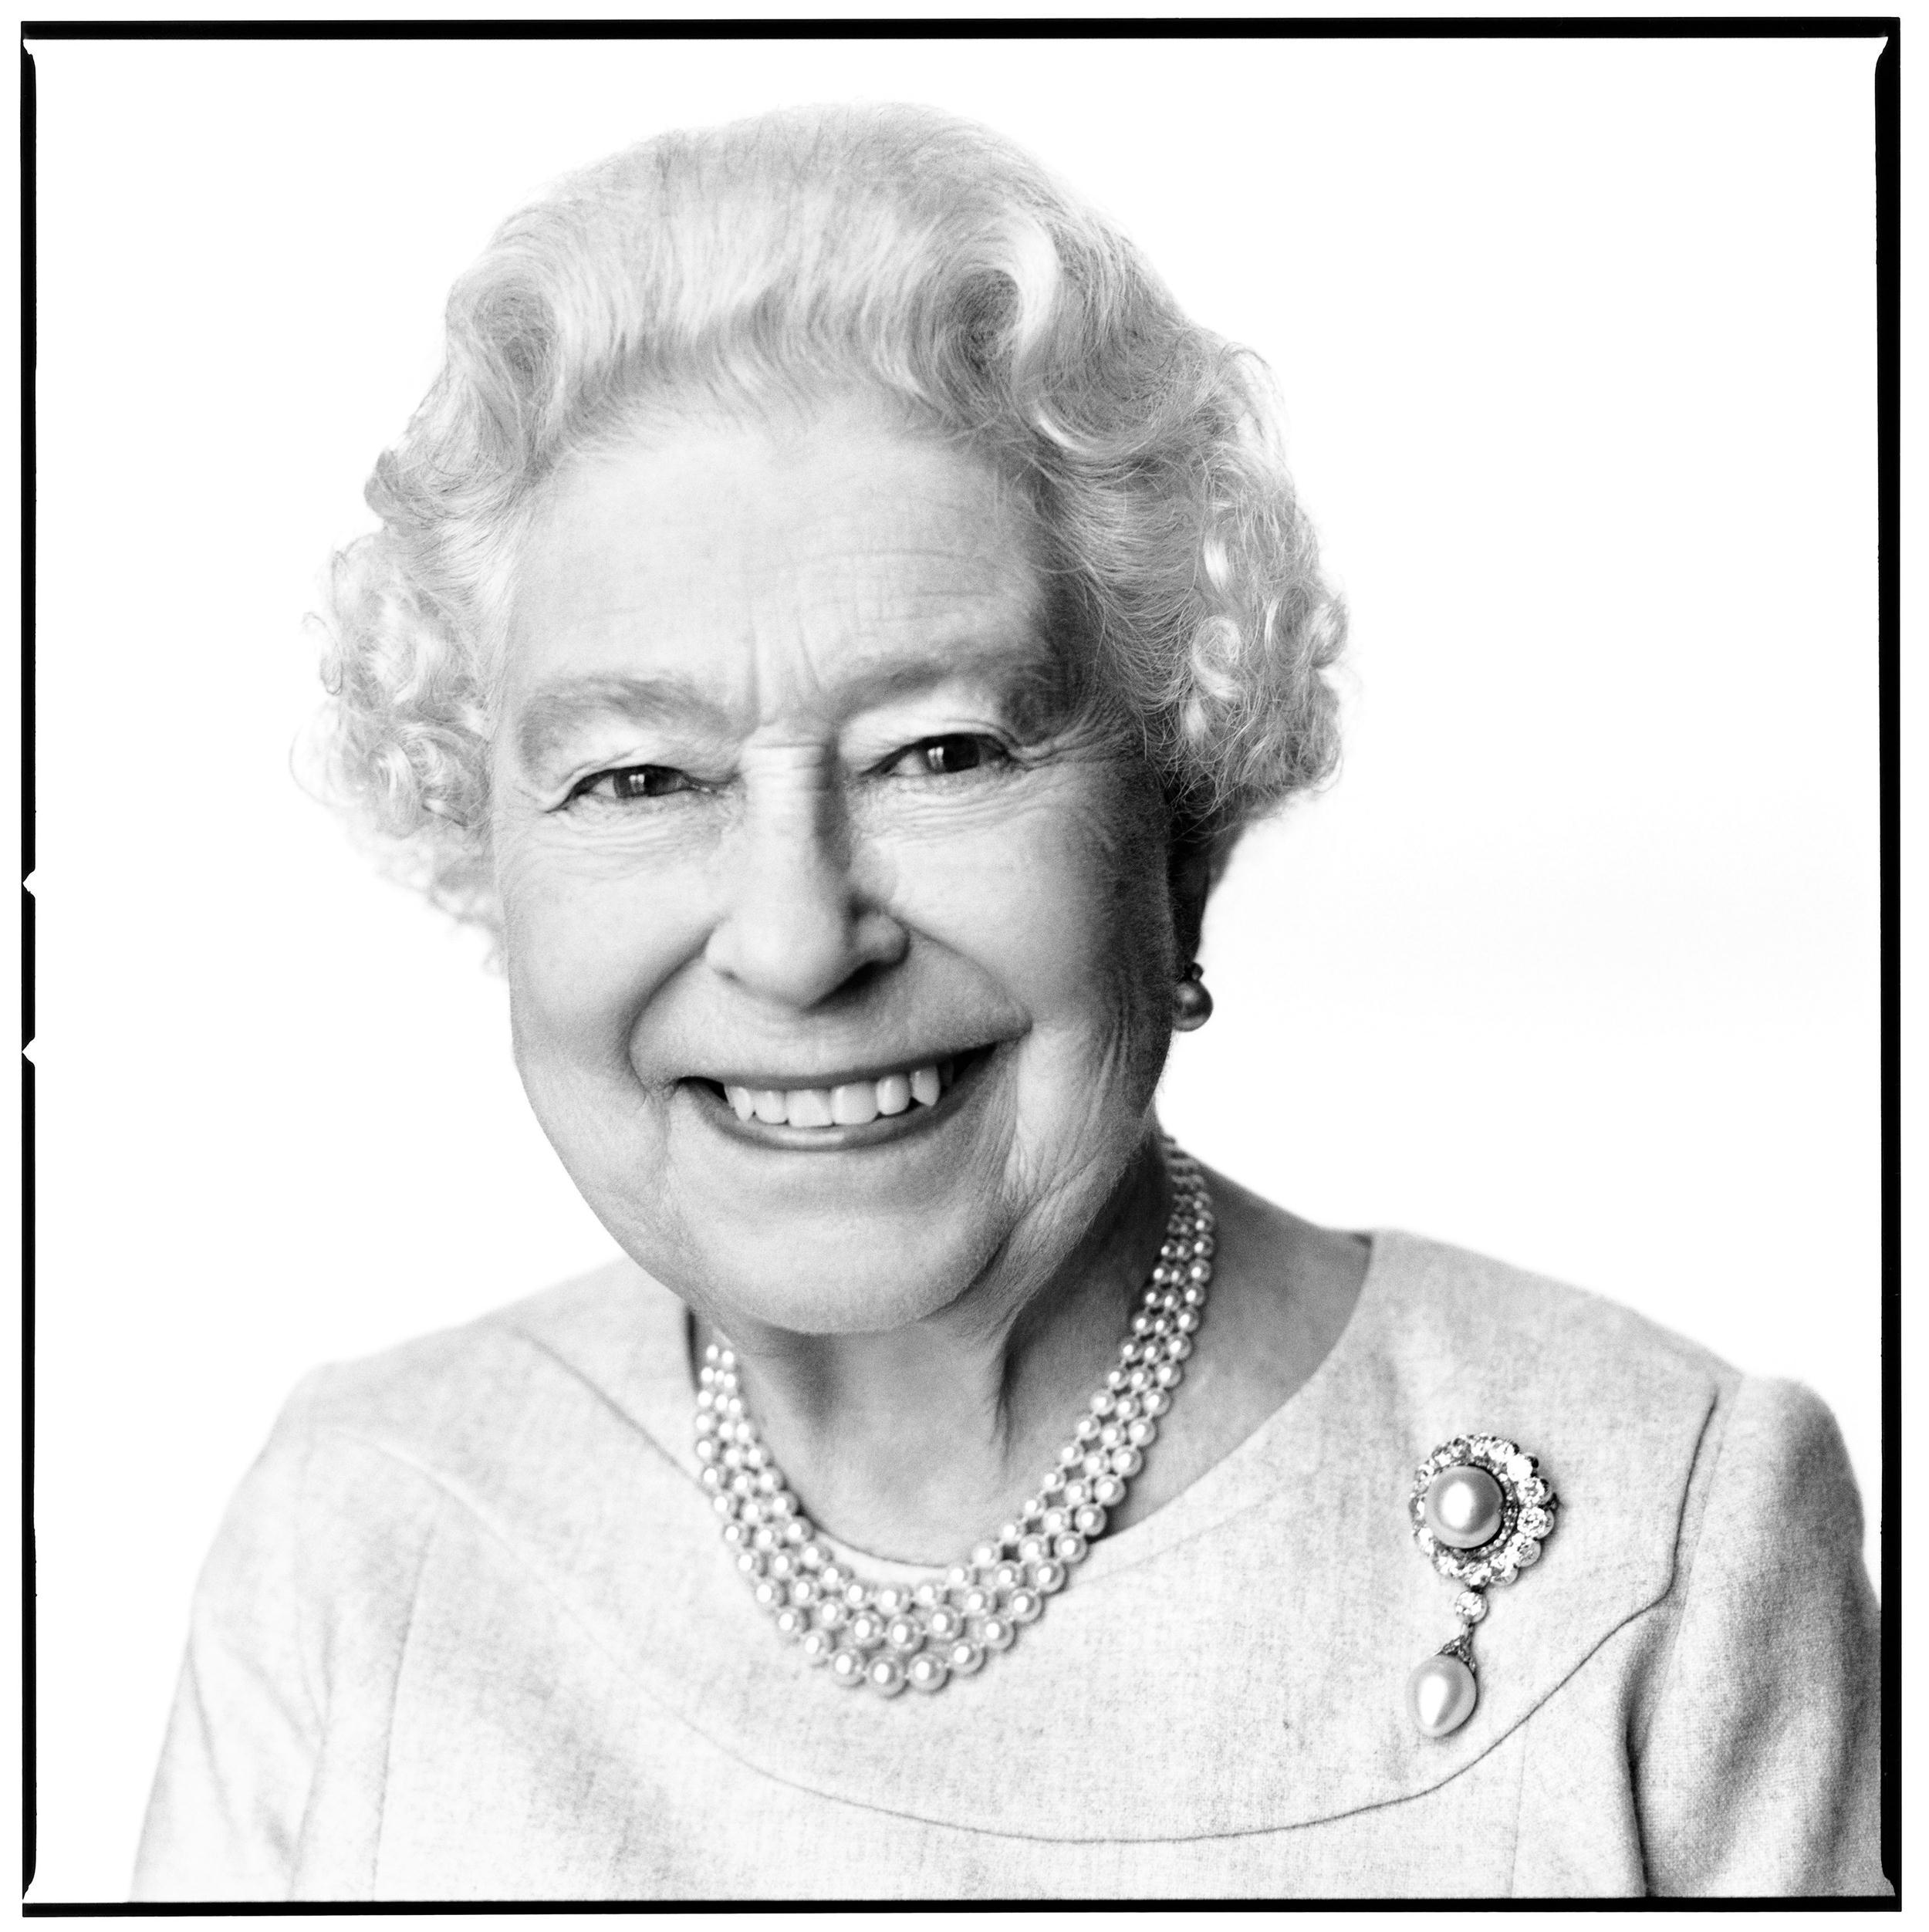 Queen Elizabeth's 'Mischievous Glint' Captured by Photography Leg...